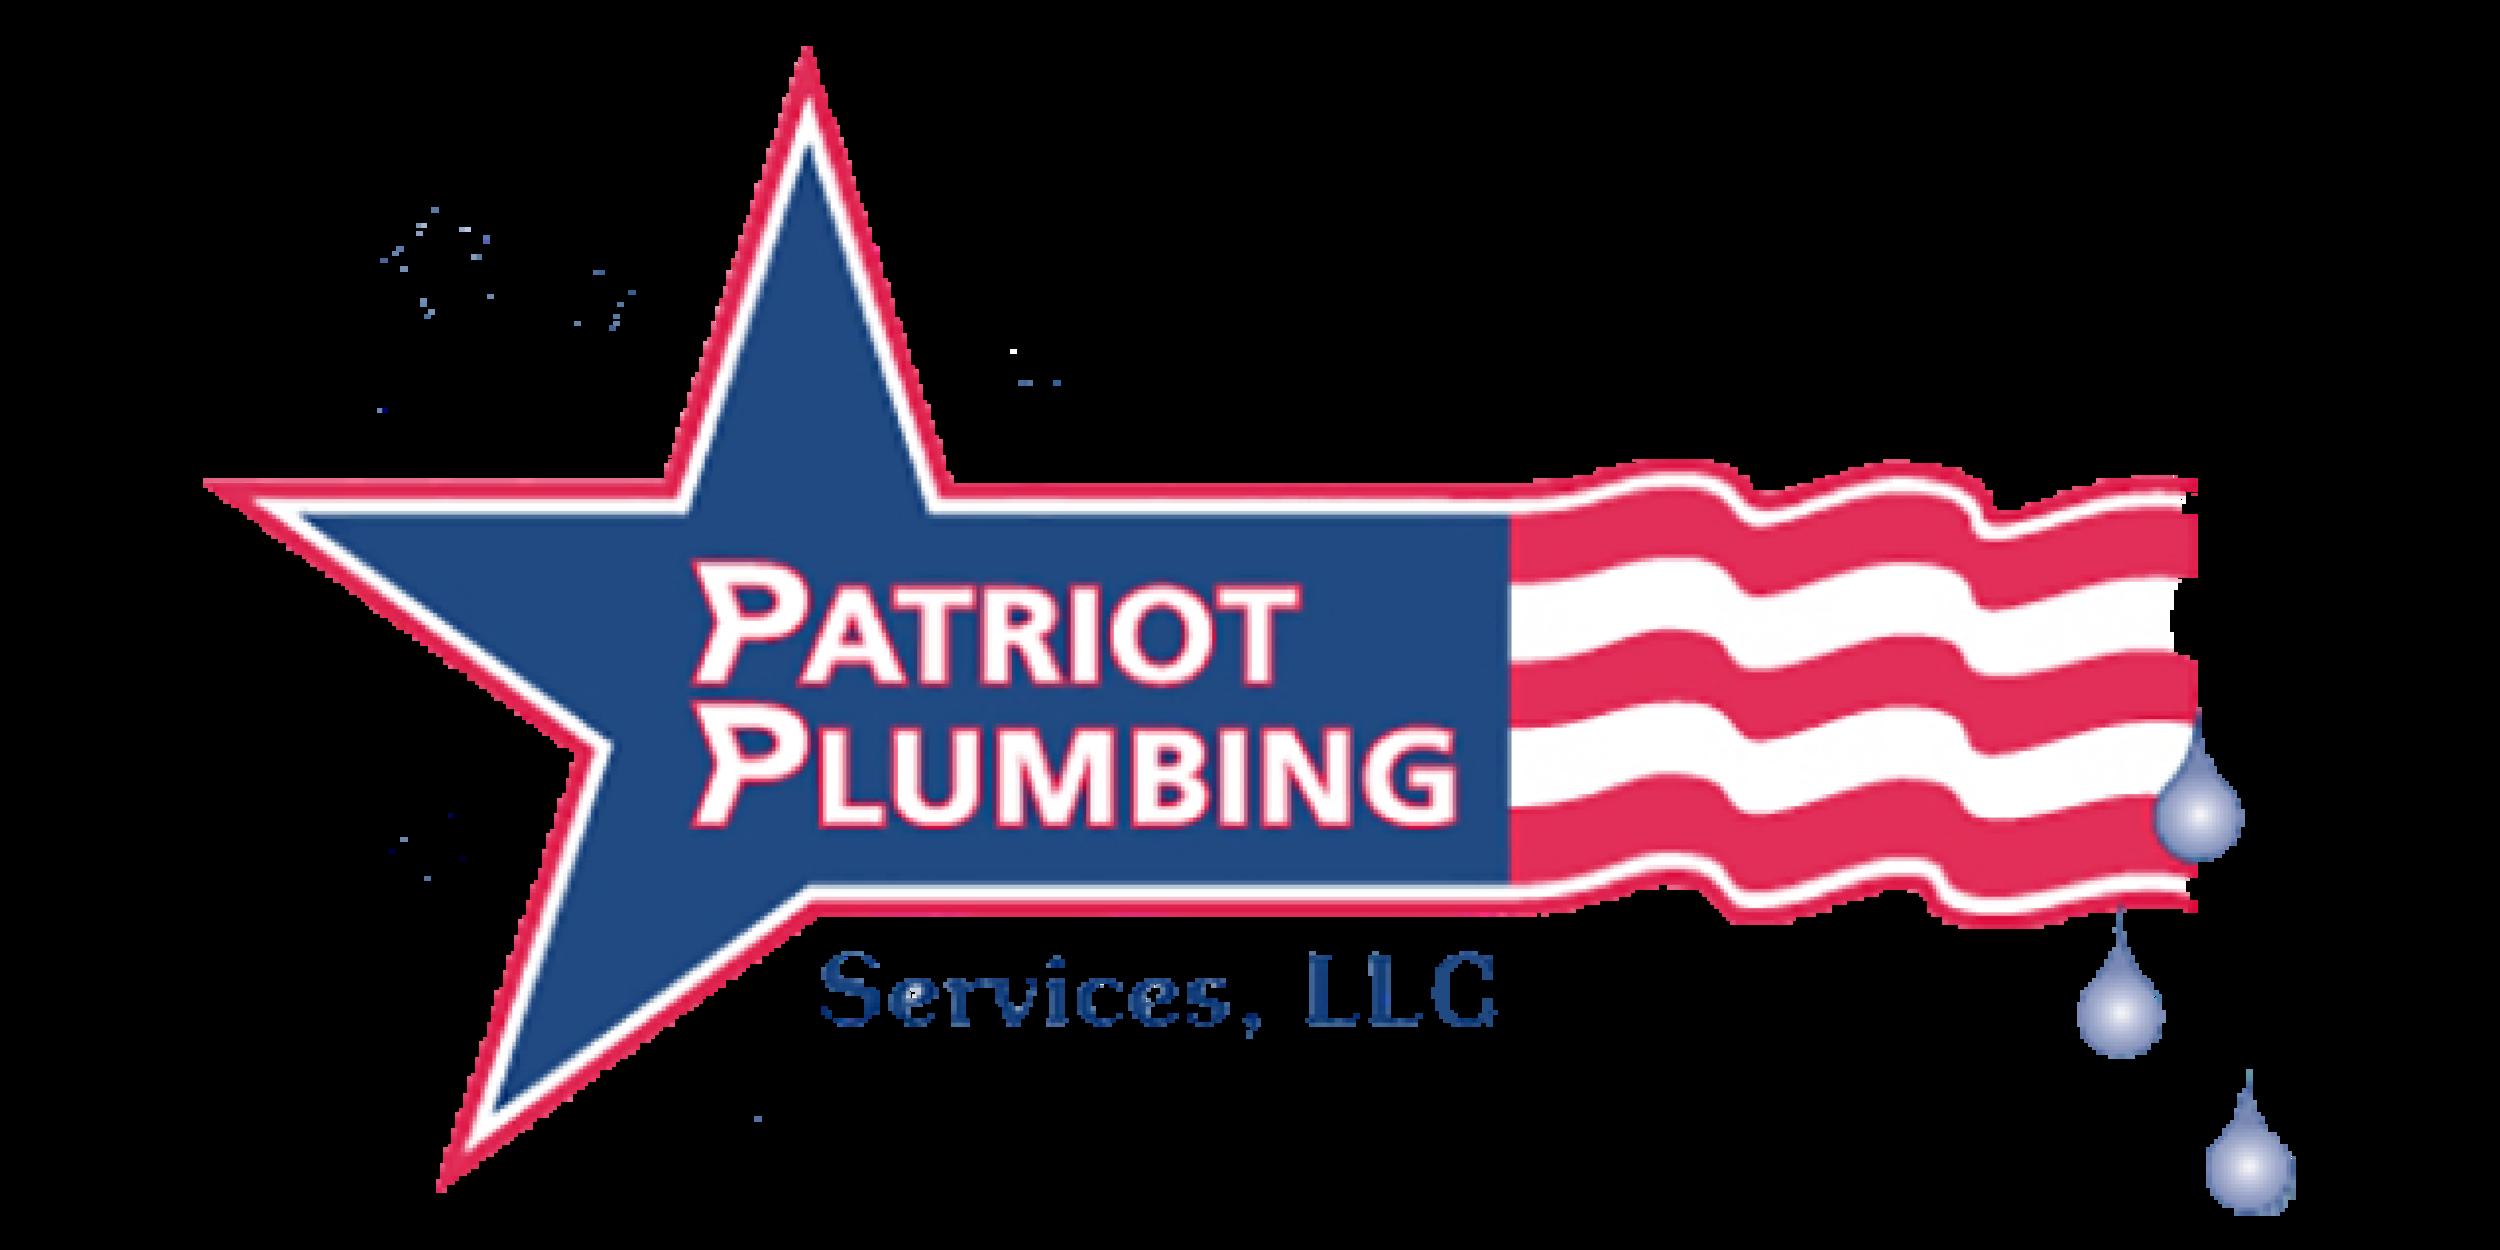 Patriot Plumbing Services LLC.